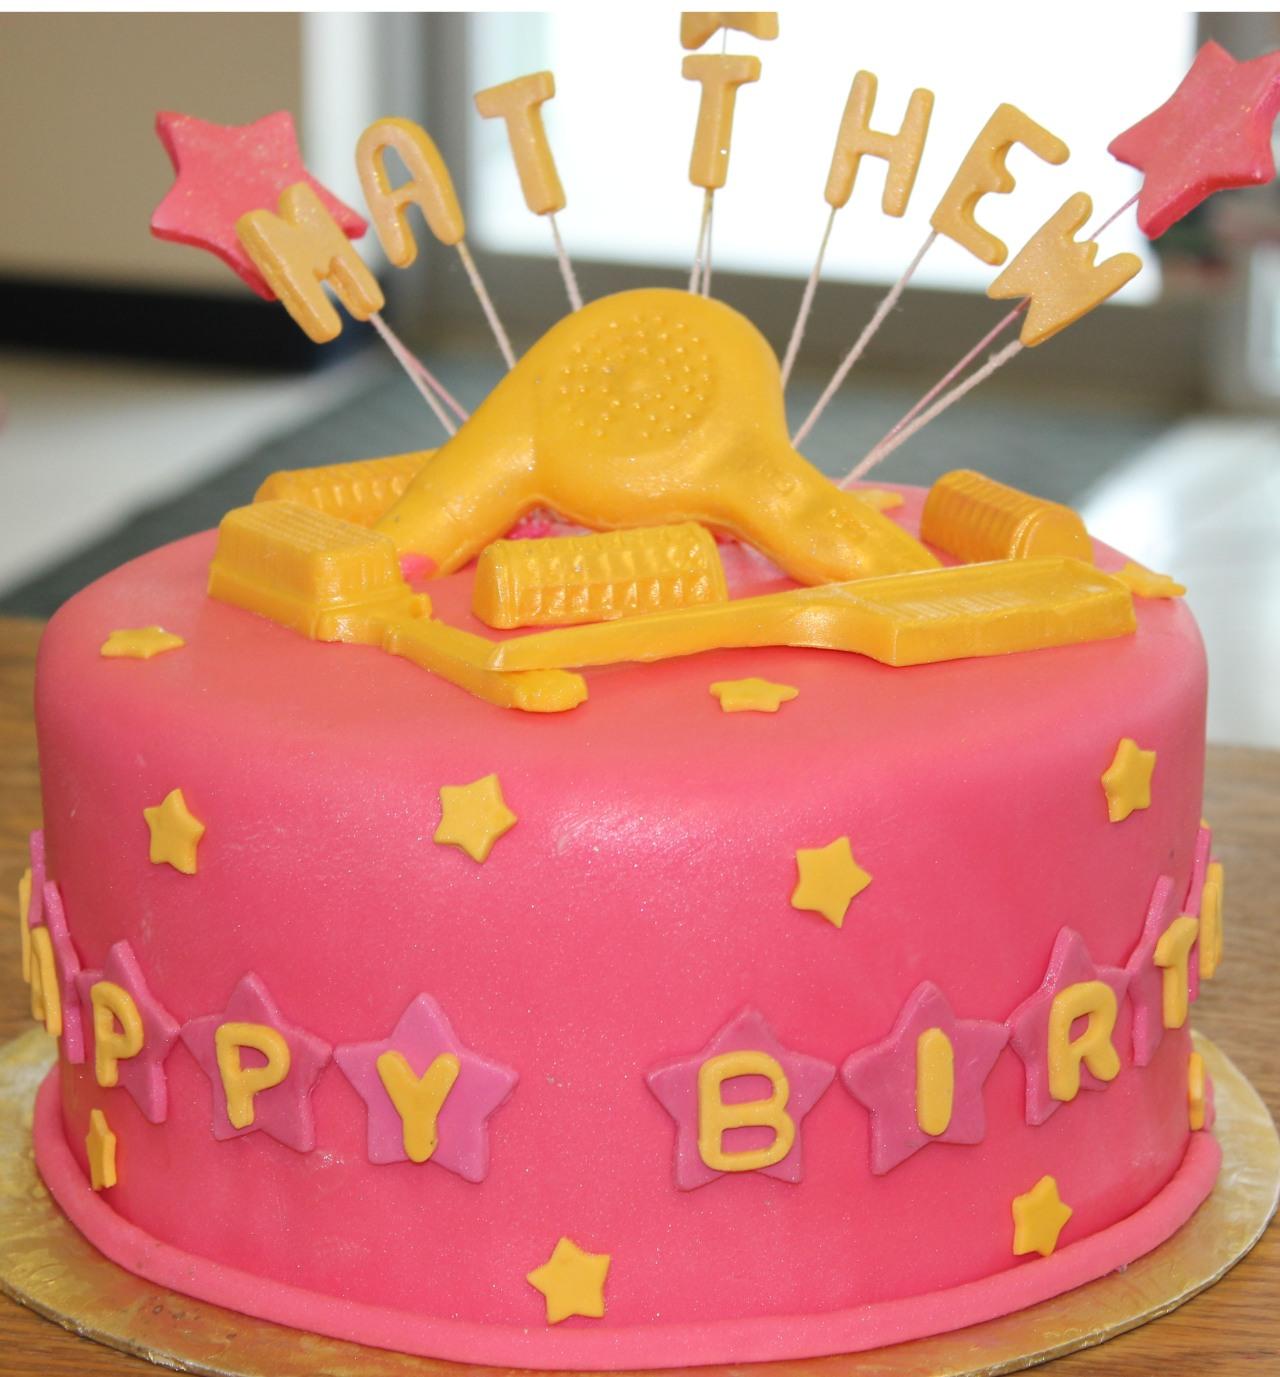 Matthew BD cake